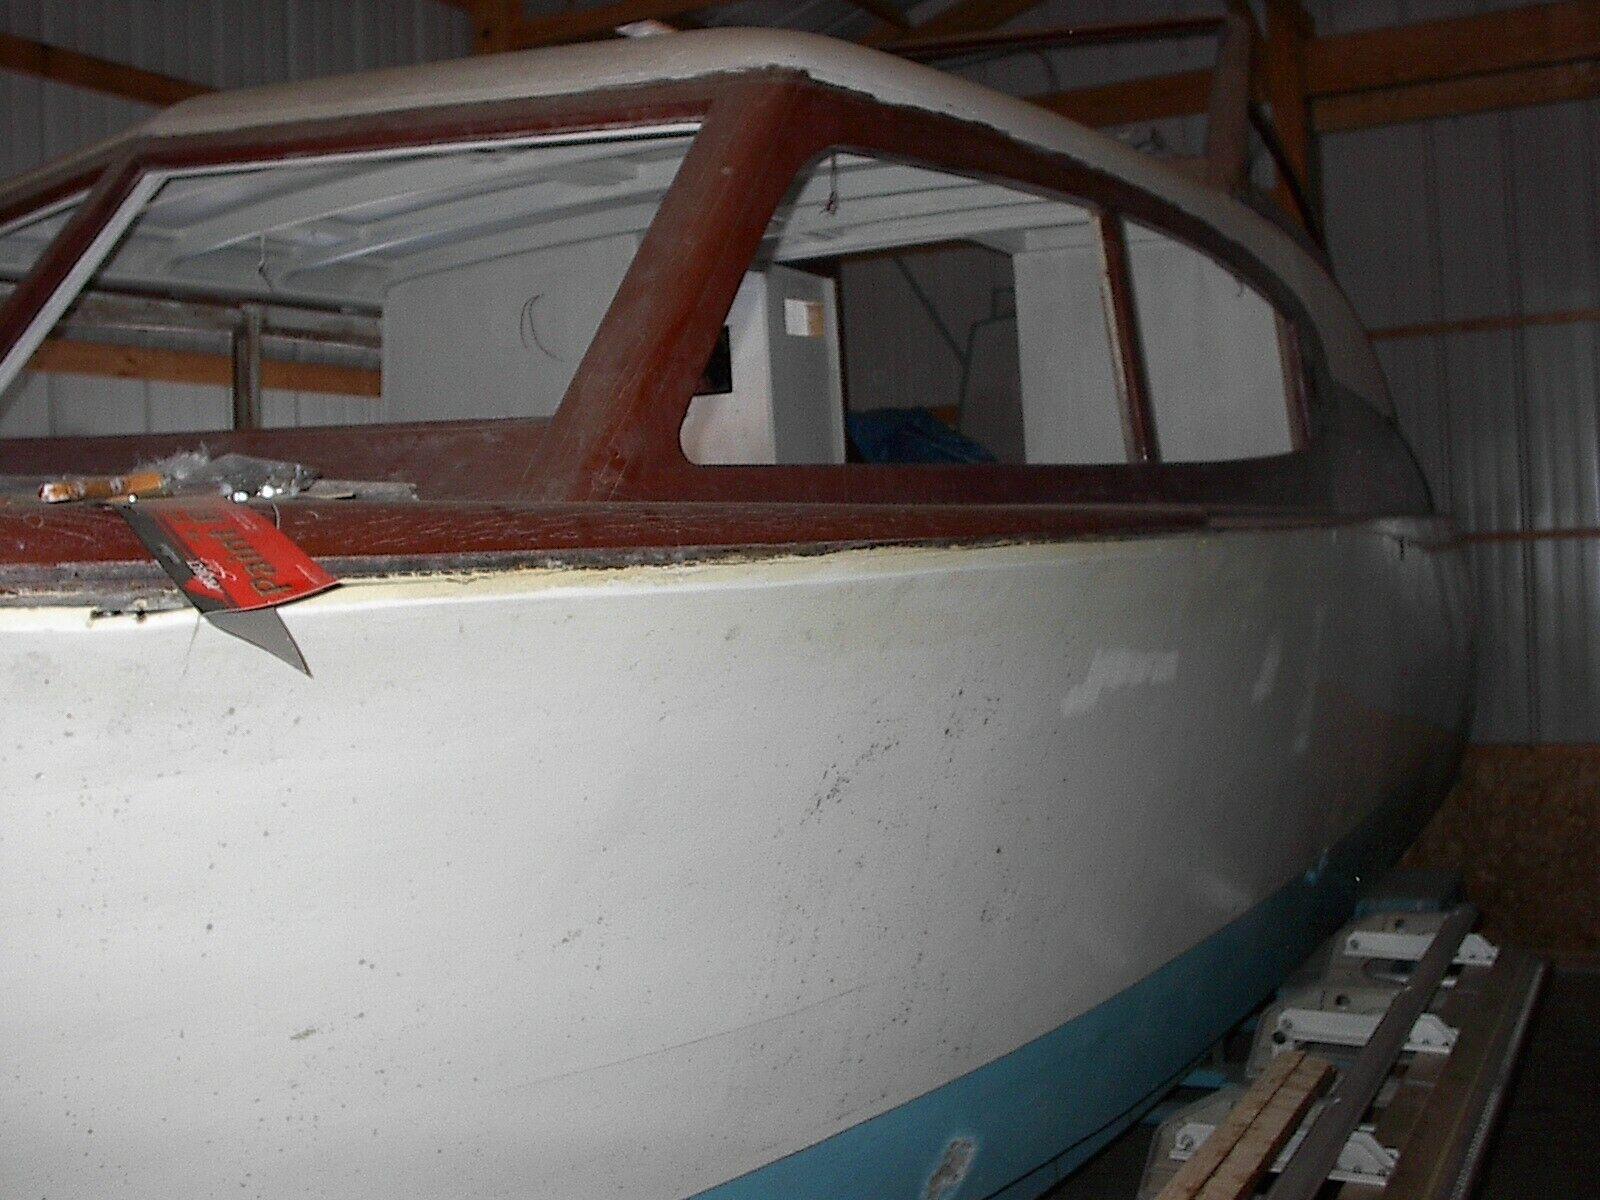 1957 Chris Craft 24 ft. Sedan Cabin Cruiser FlyBridge wood hull